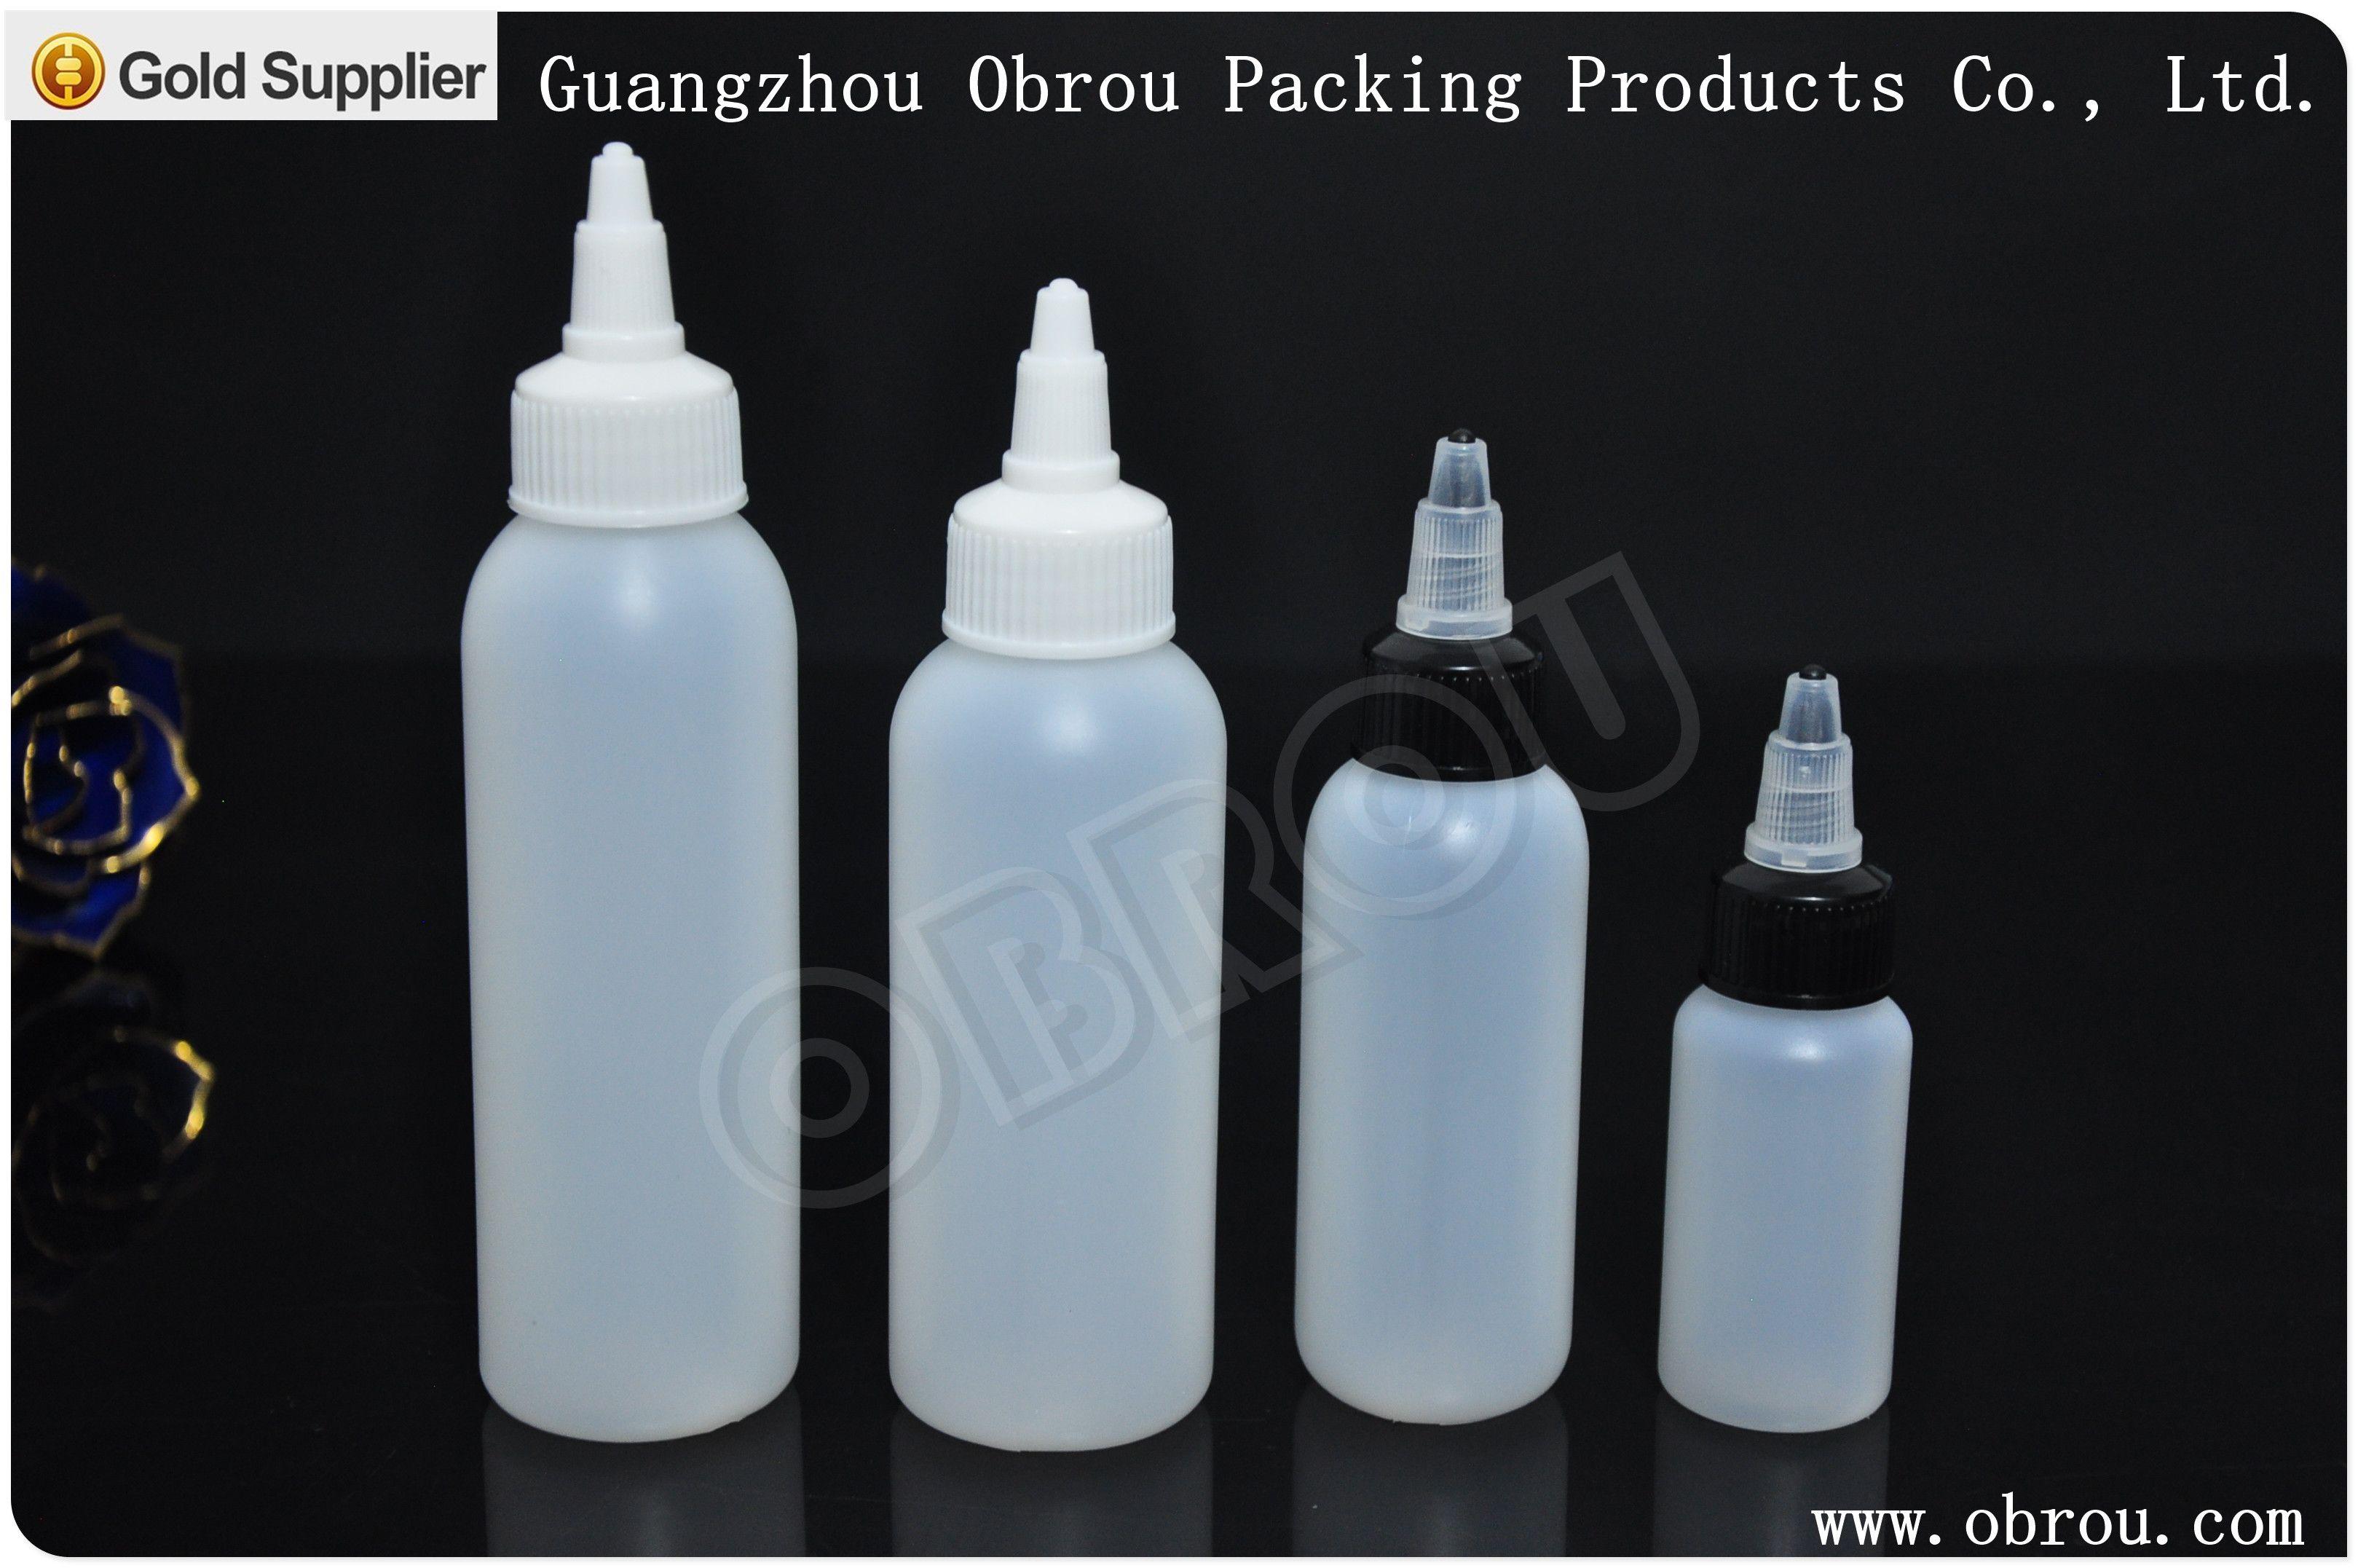 Wholesale Twist Top Cap Sealing Type 30ml Pe Plastic E Liquid Dropper Bottle Bottle Dropper Bottles Gold Supplier